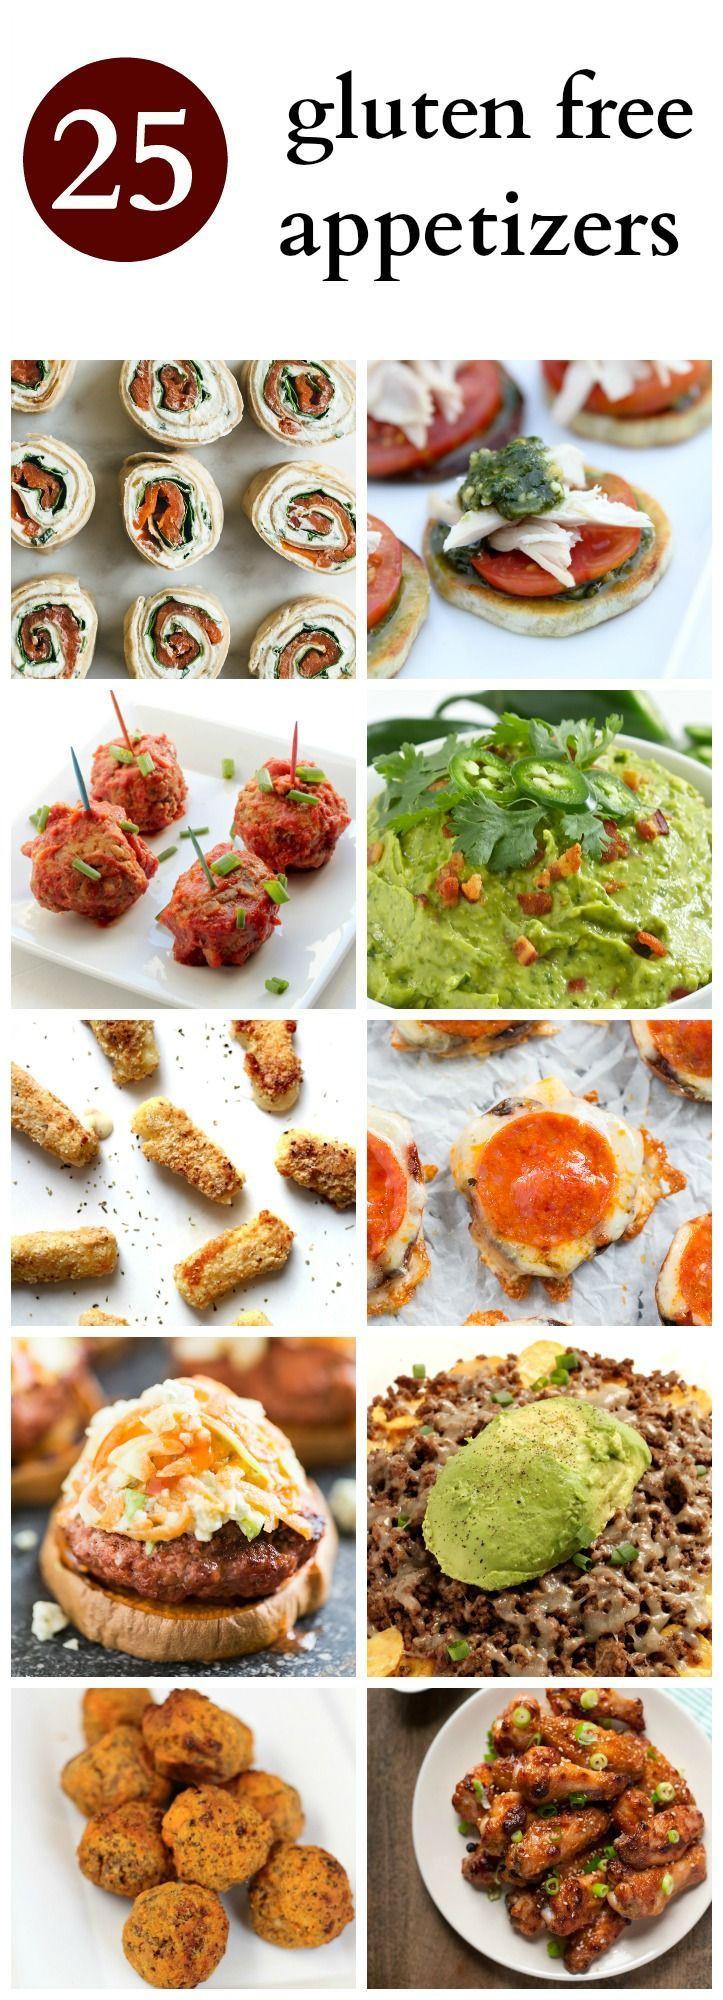 Gluten Free Foods Recipes  25 best ideas about Gluten Free Appetizers on Pinterest